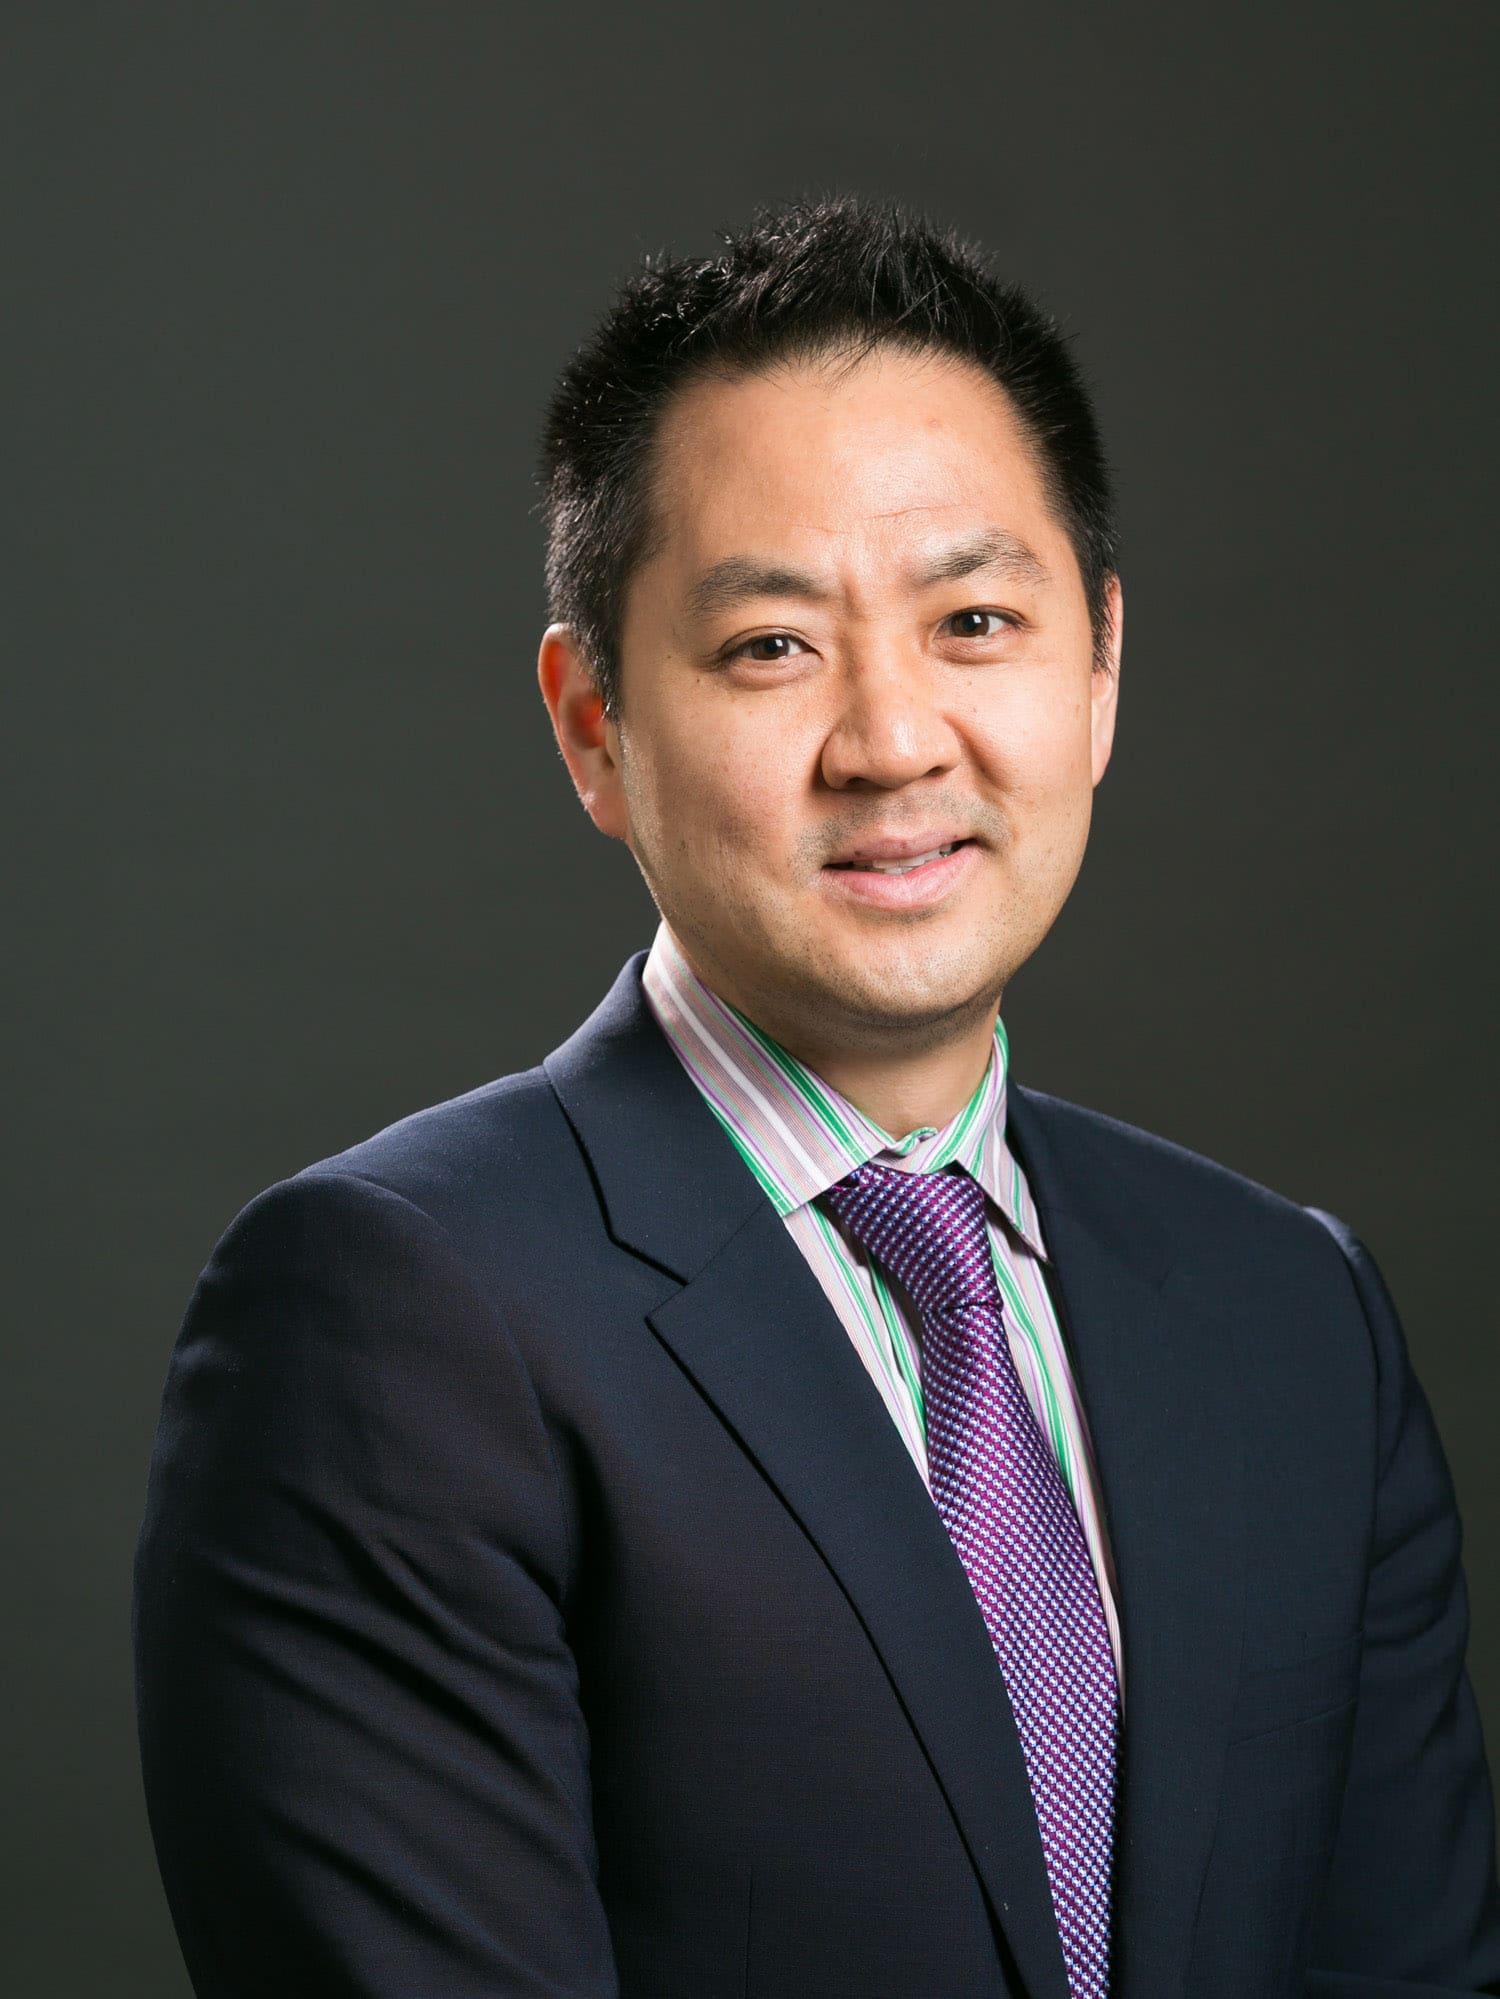 Peter Whang